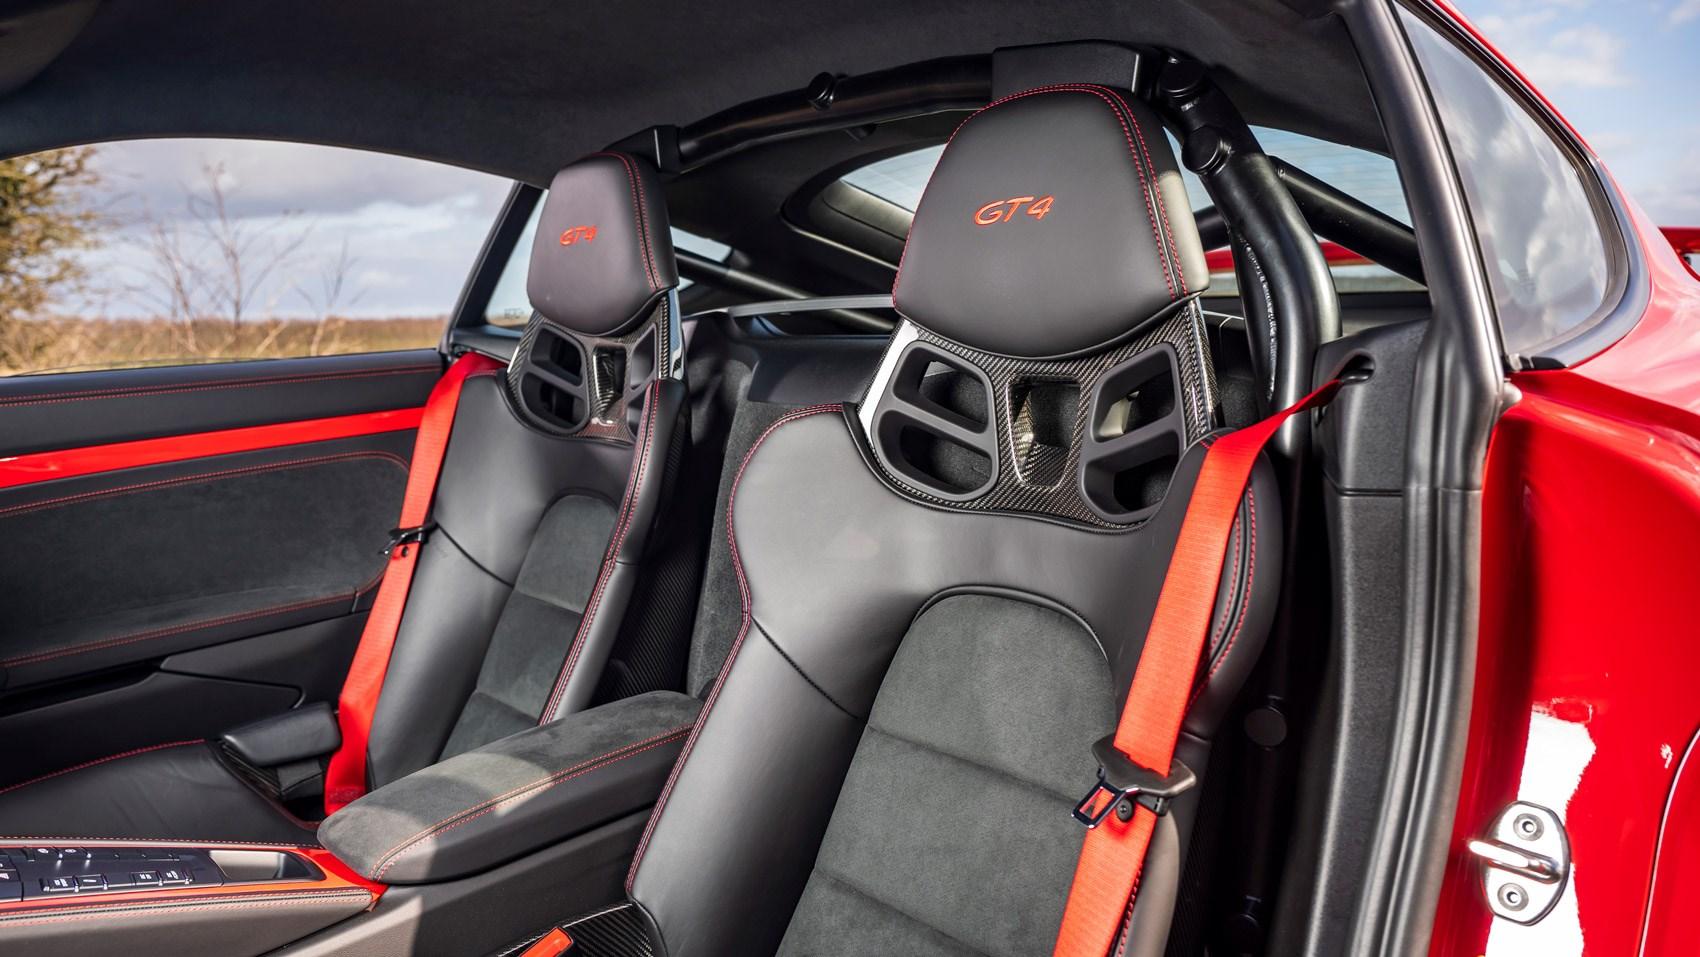 cayman gt4 seats